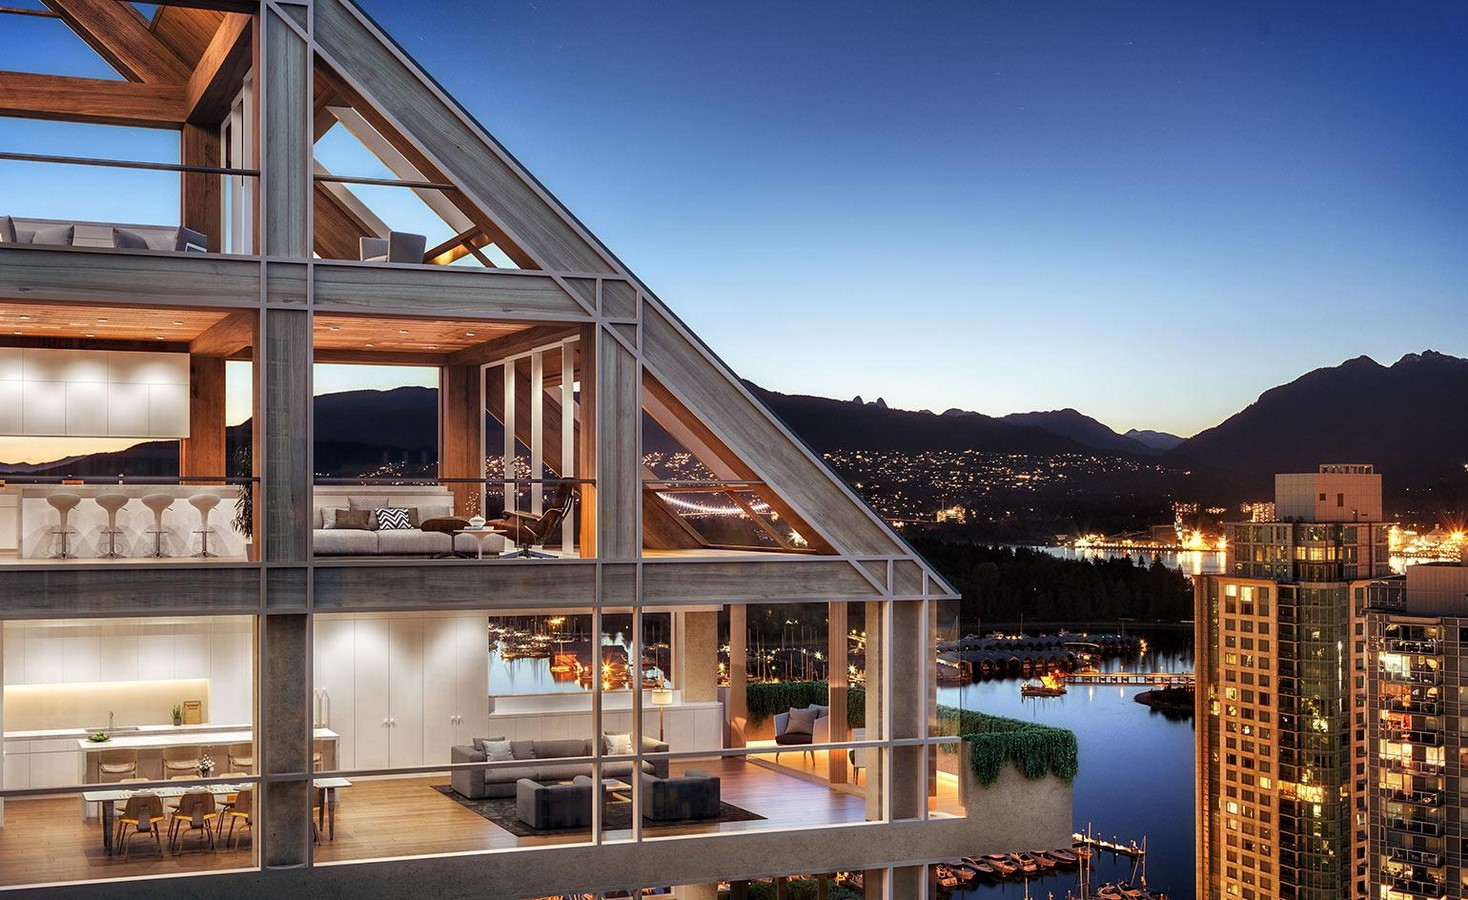 Terrace House by Shigeru Ban: The Tallest Hybrid Wood Tower - Sheet2